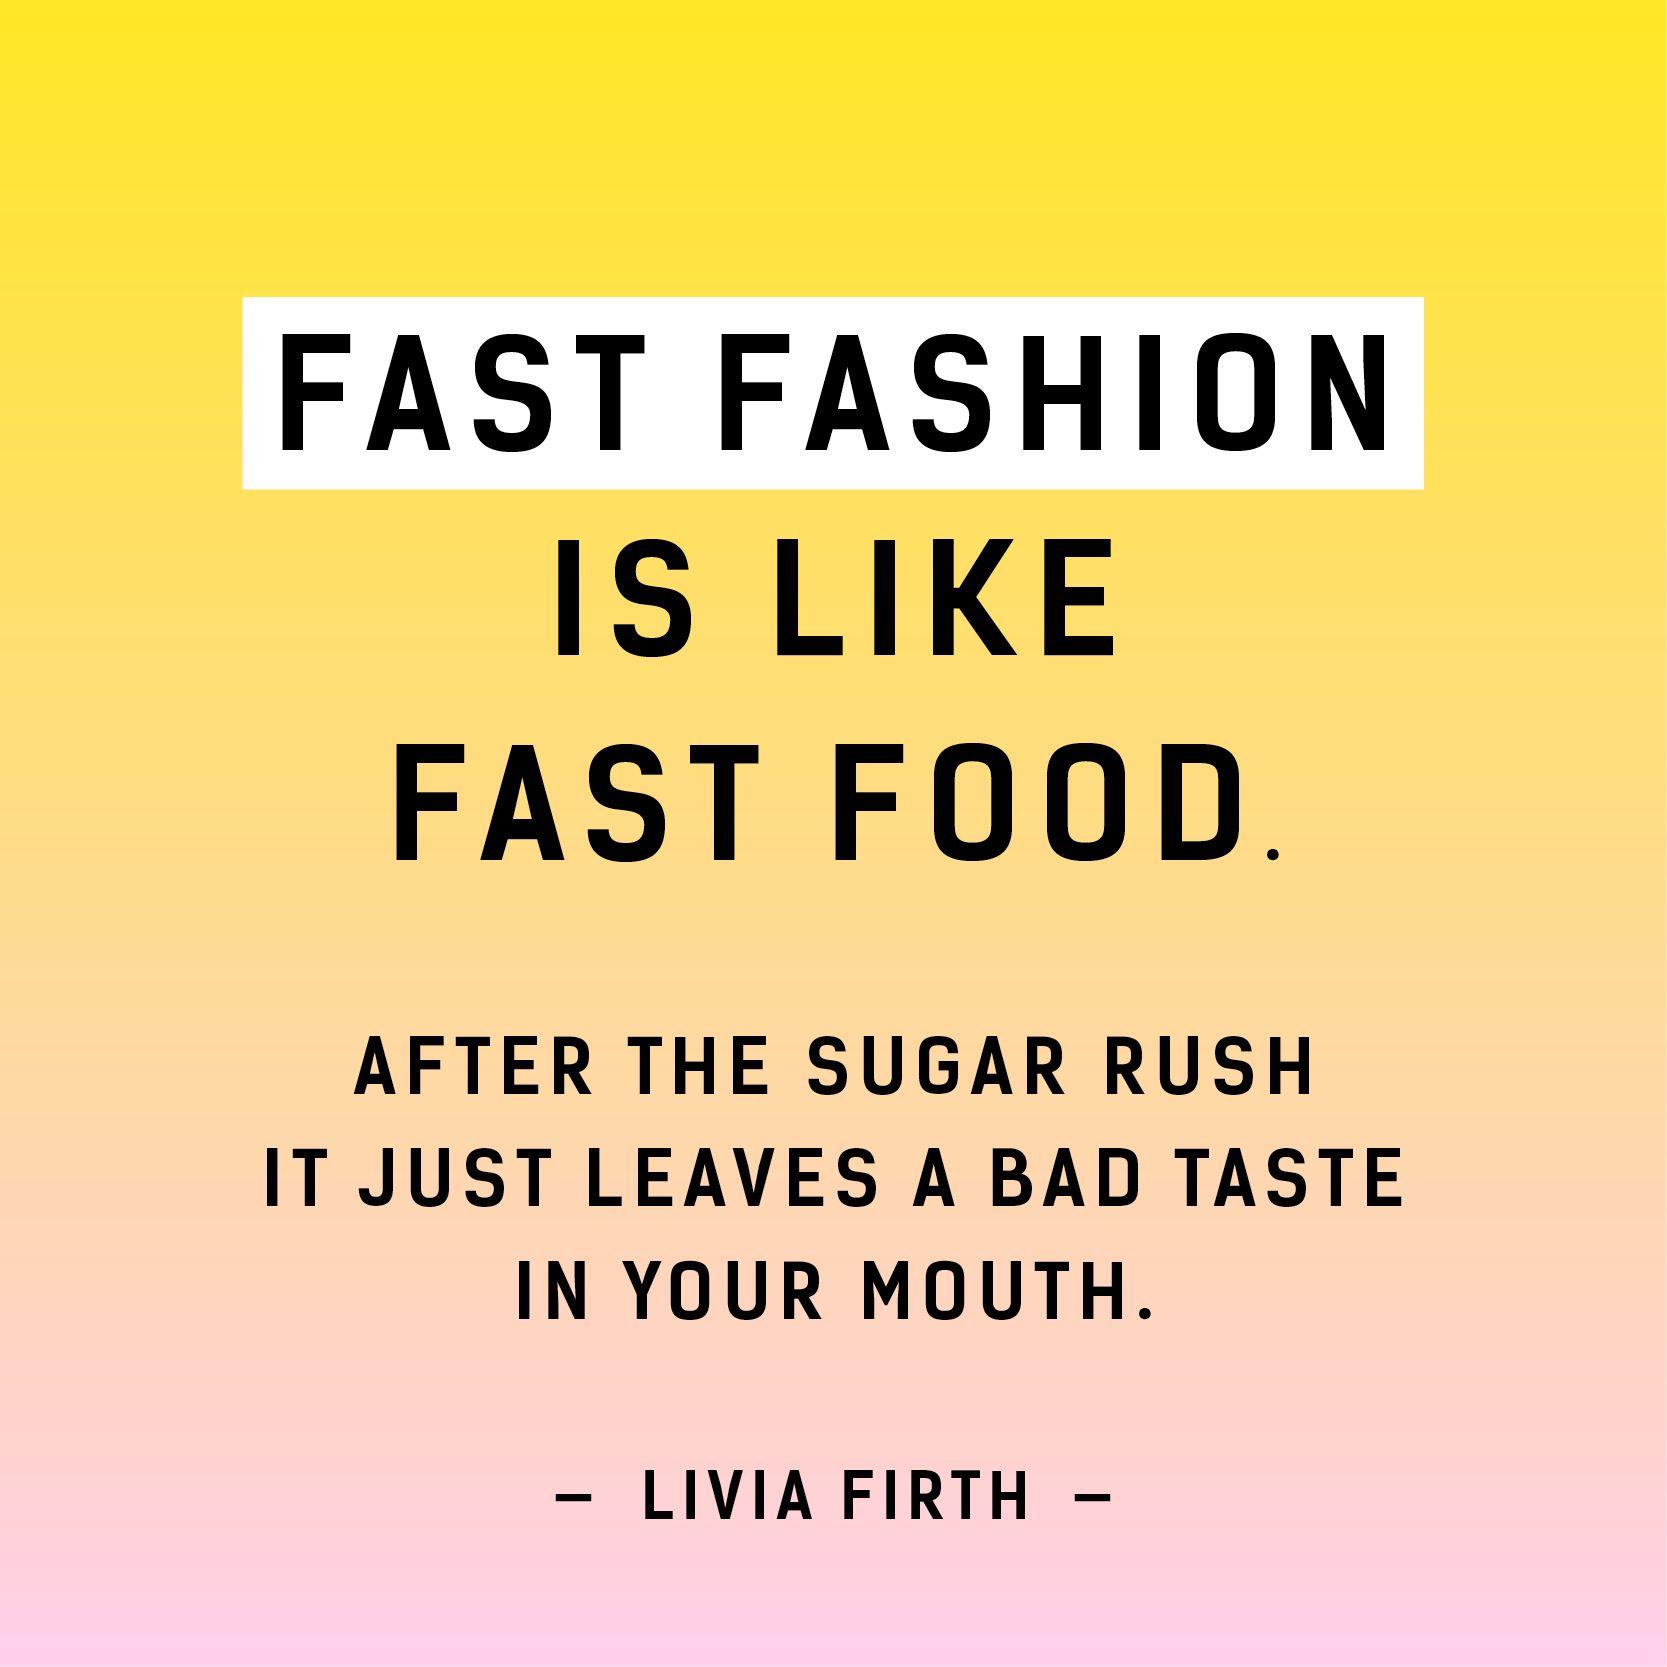 fast fashion lifestyle gaya hidup fast fashion